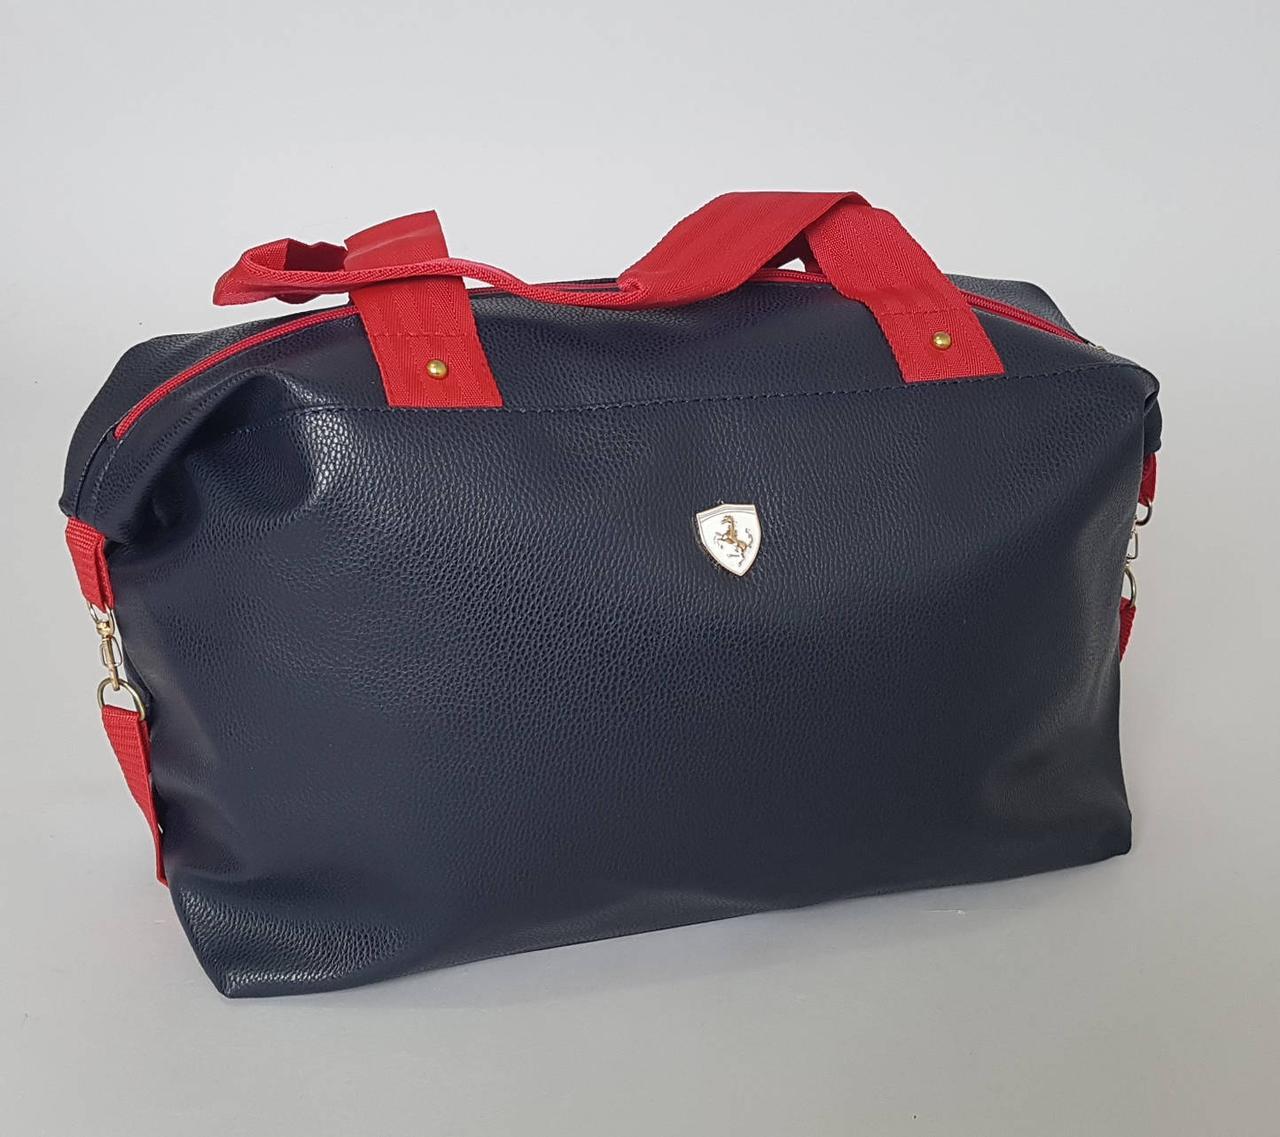 Cпортивная сумка темно синий цвет